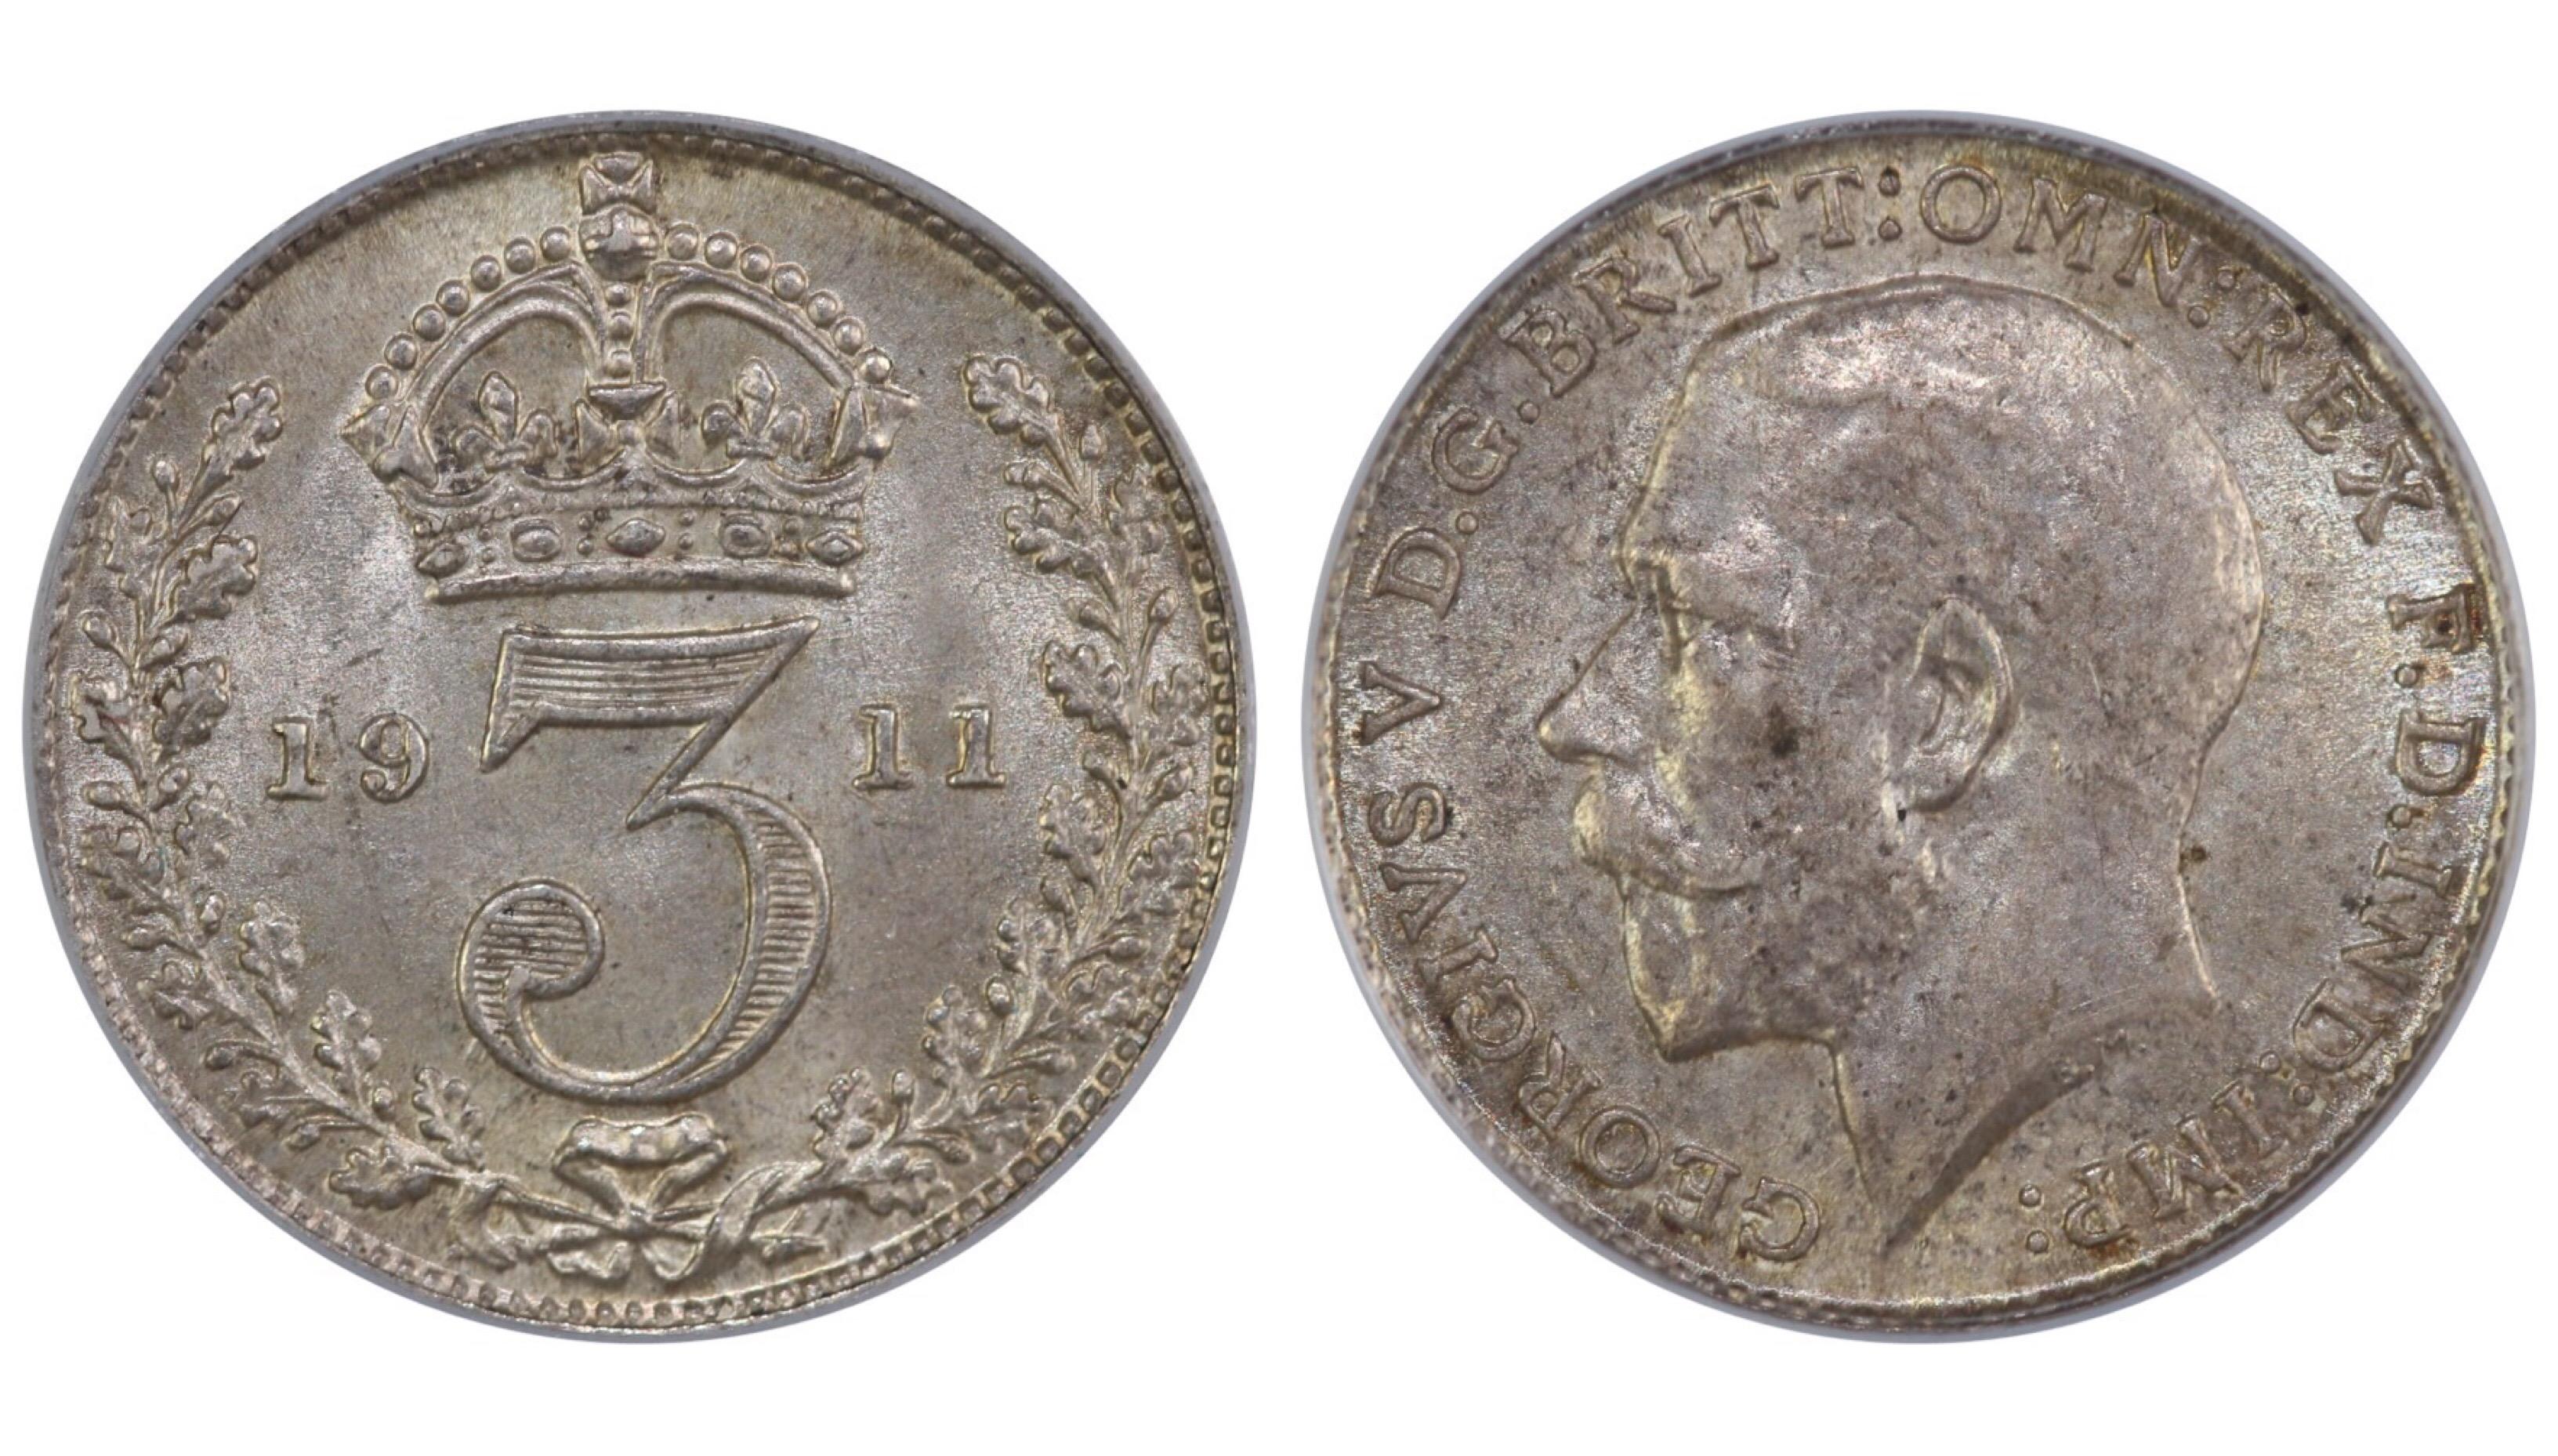 1911 Threepence, CGS 78, George V, Davies 1923, UIN 26694